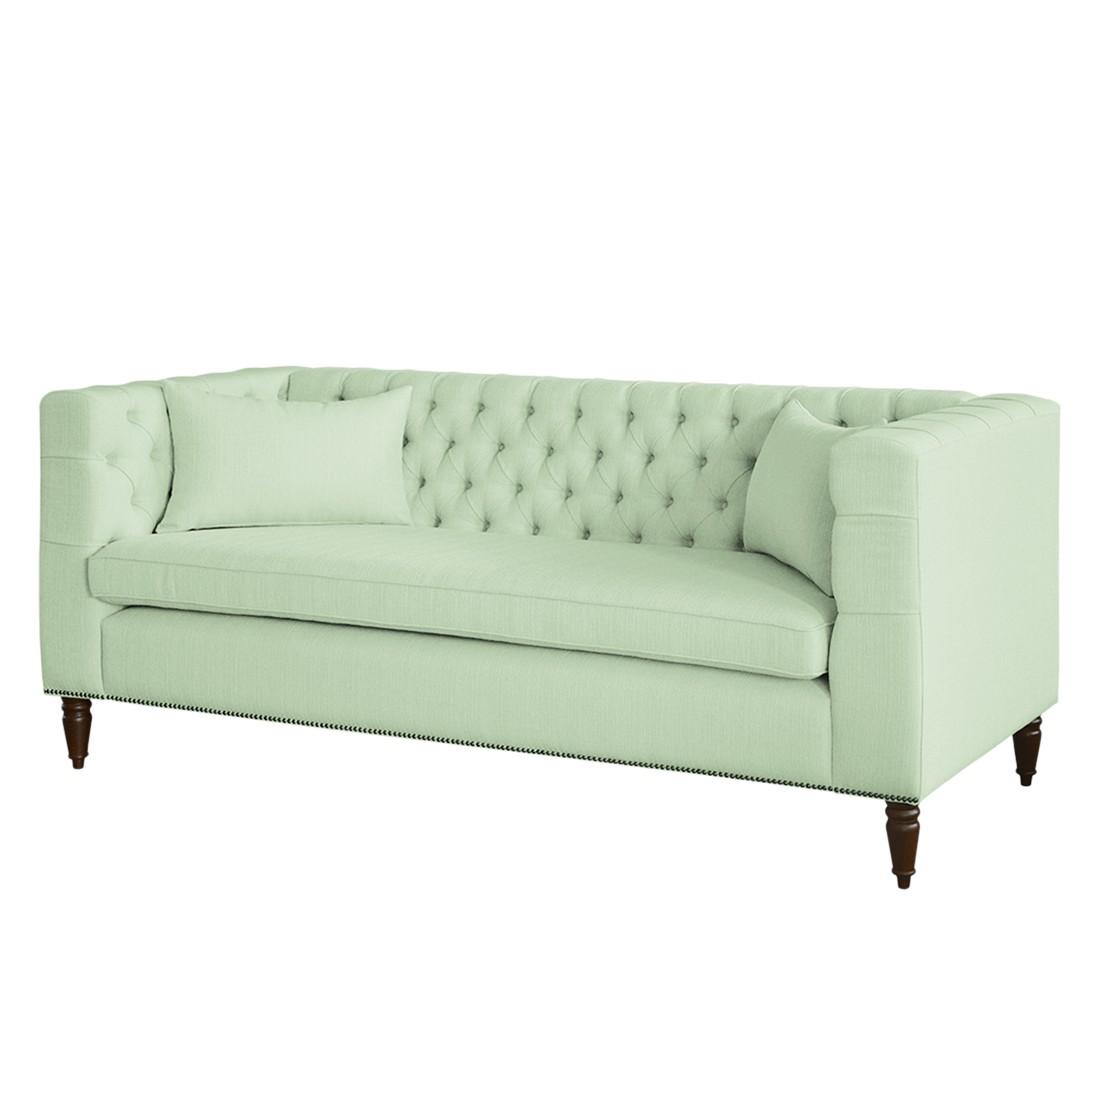 Sofa Sherbrooke (3-Sitzer) Strukturstoff